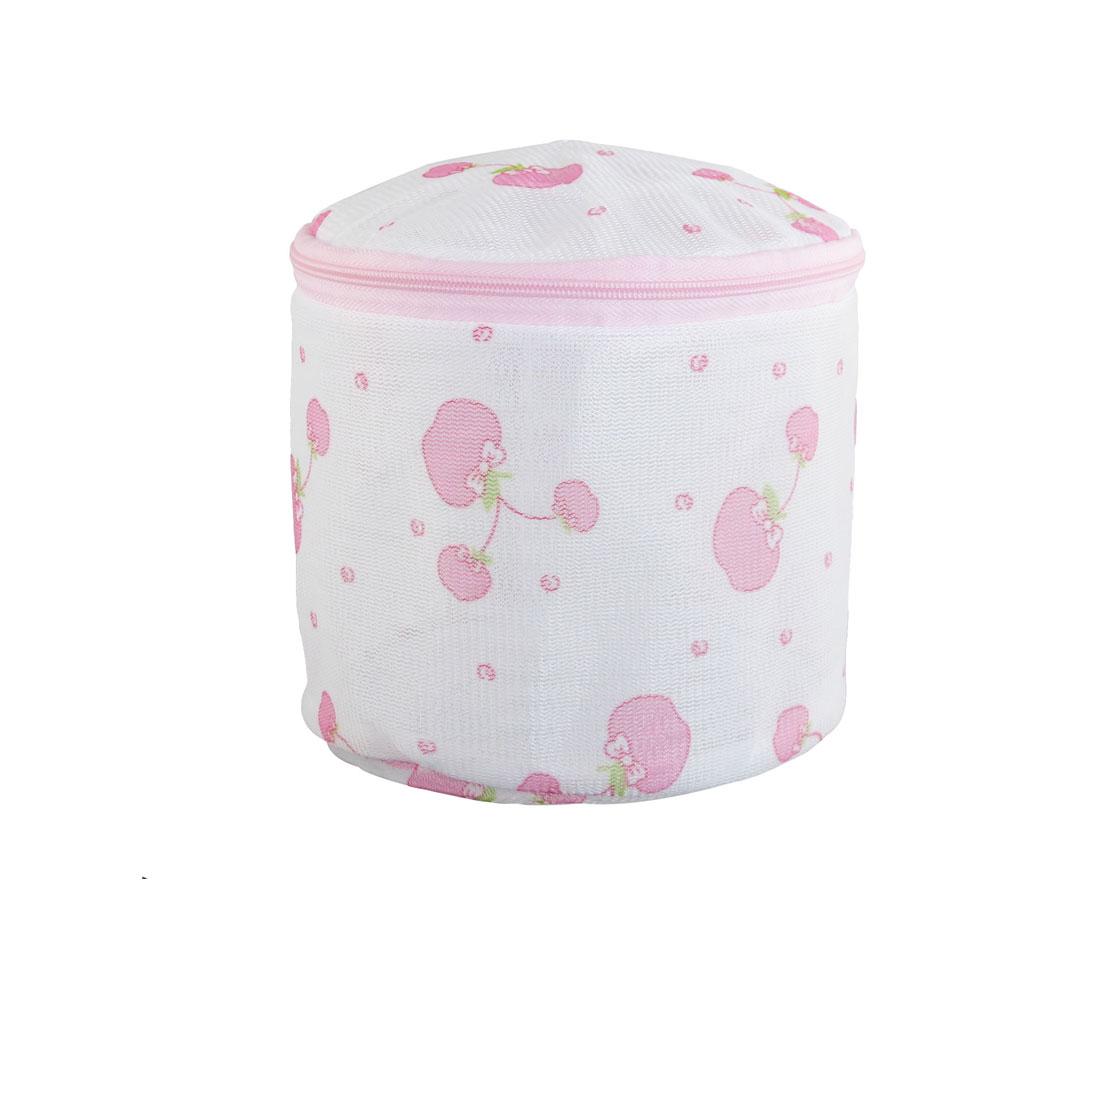 Plastic Frame Apple Print Meshy Folding Underwear Bra Washing Bag White Pink